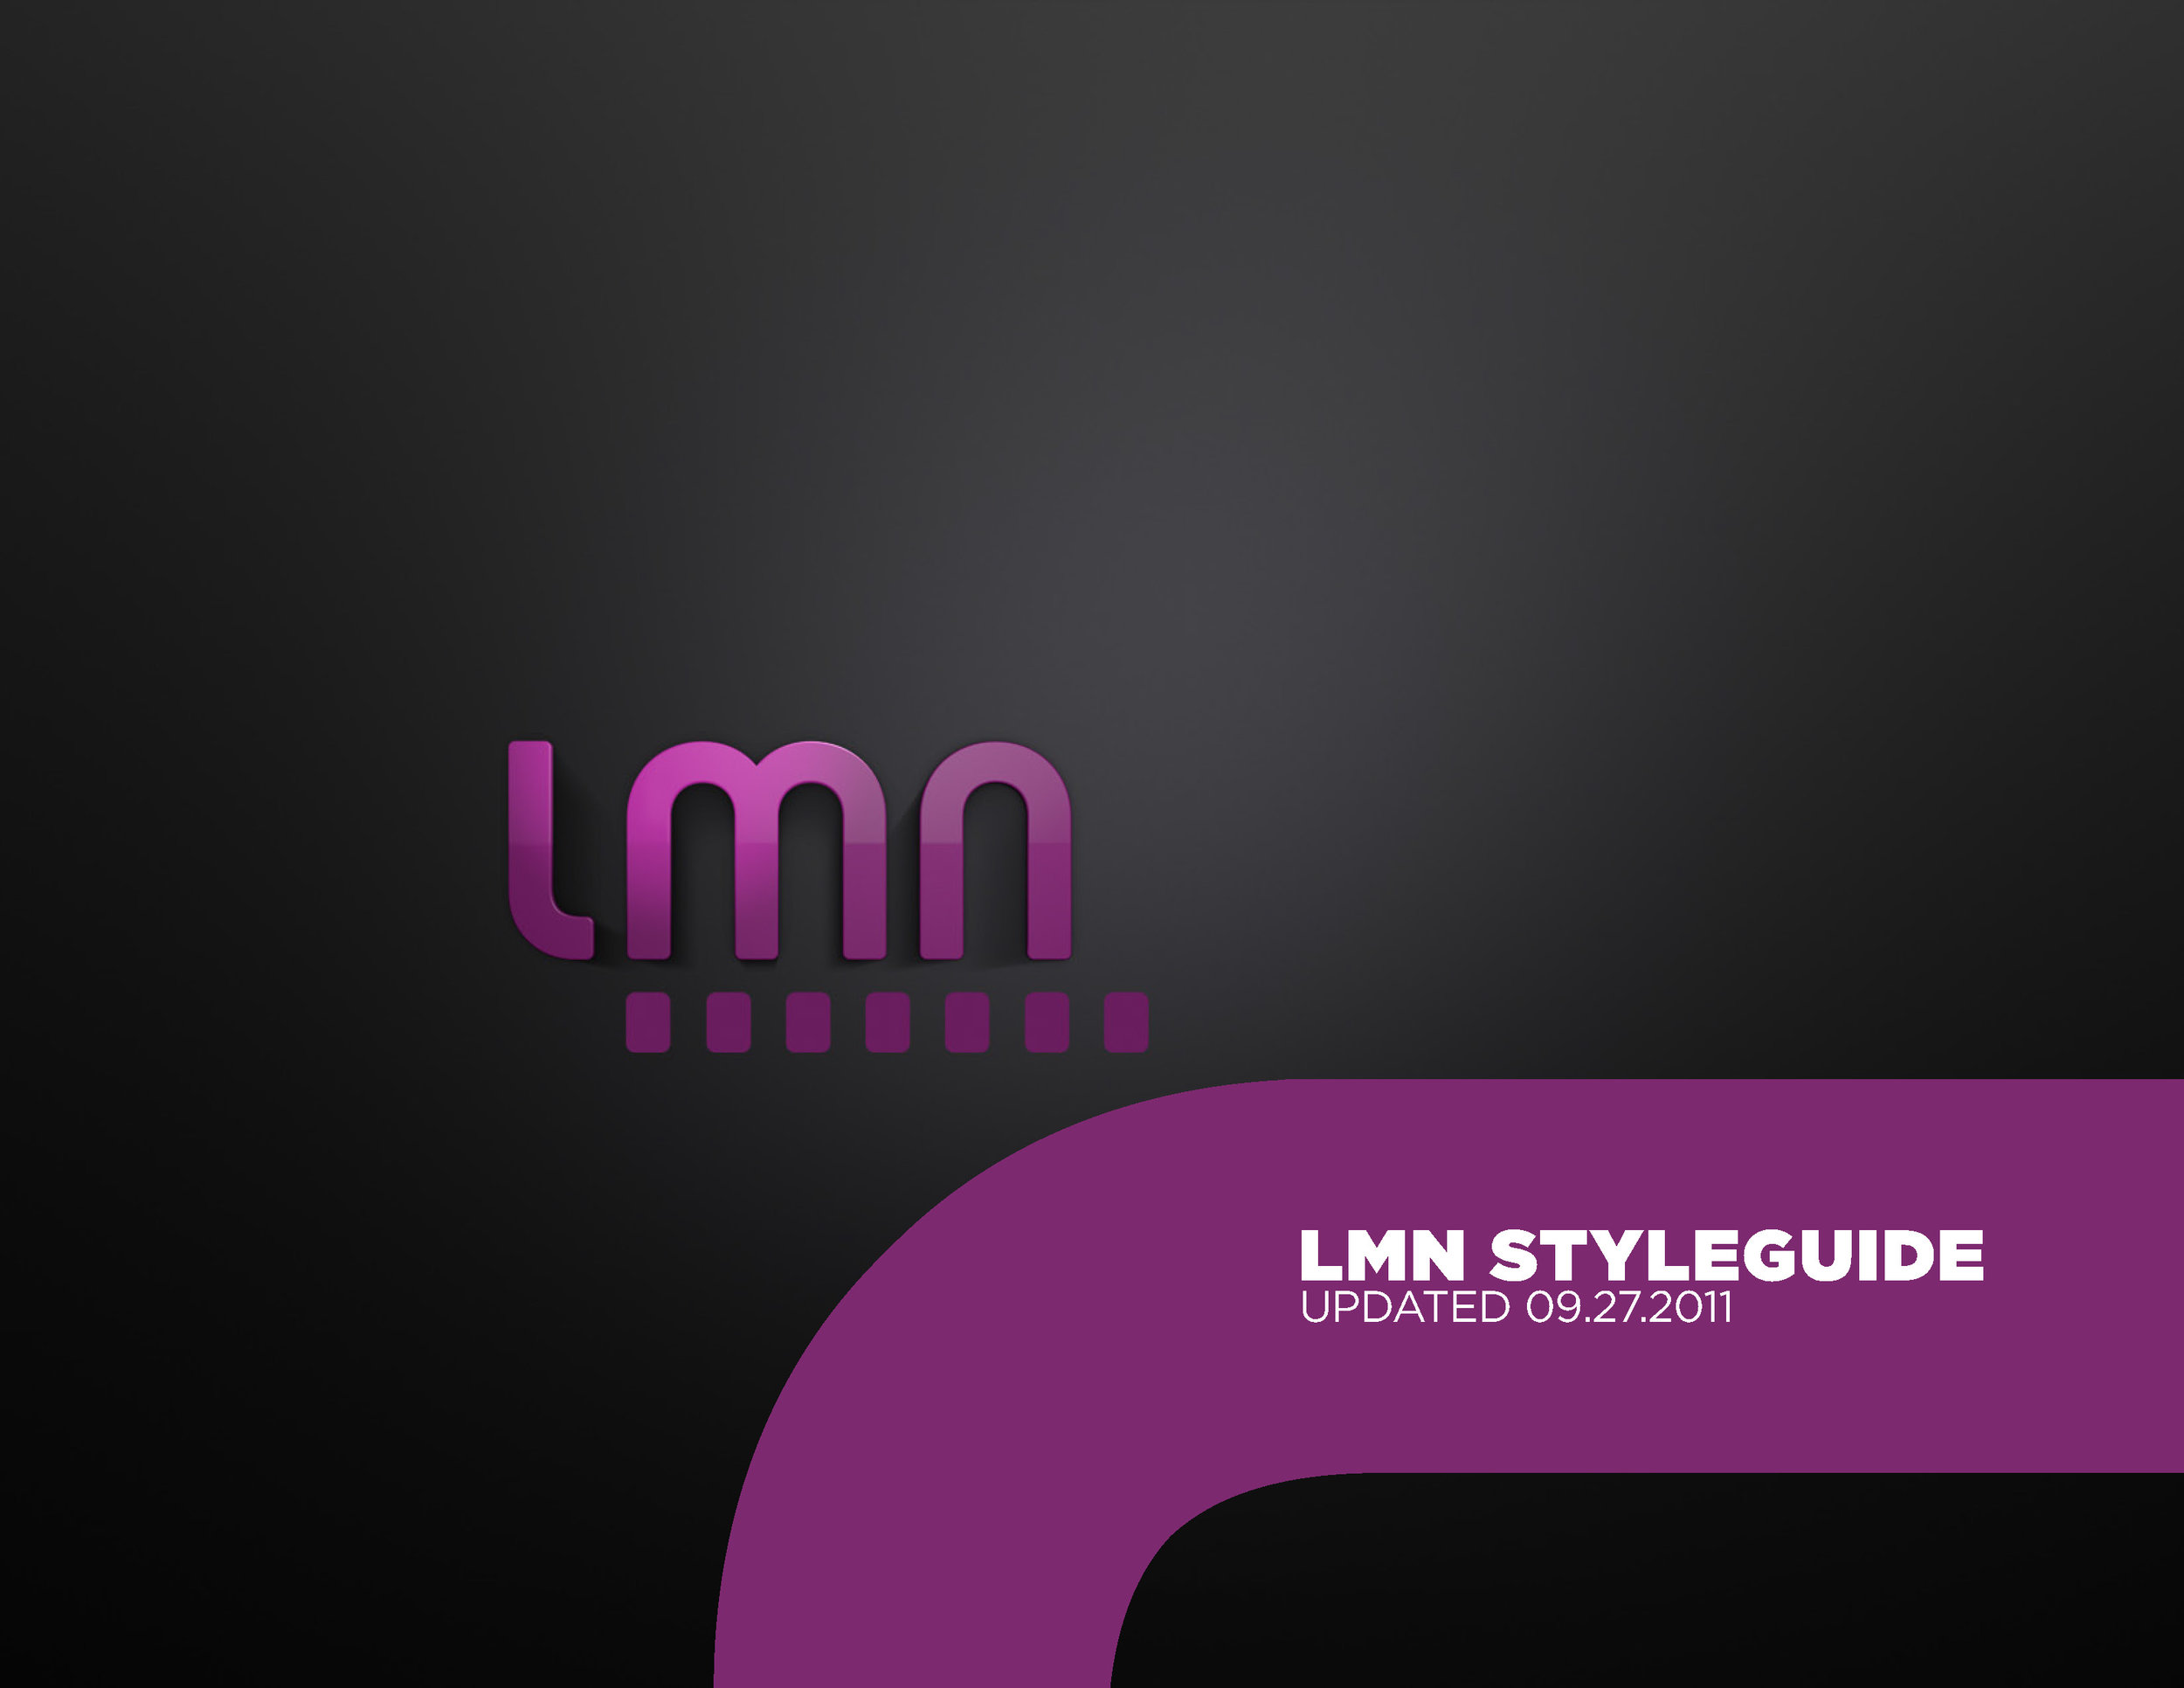 LMN_styleguide_092711_HQ_Page_01.jpg